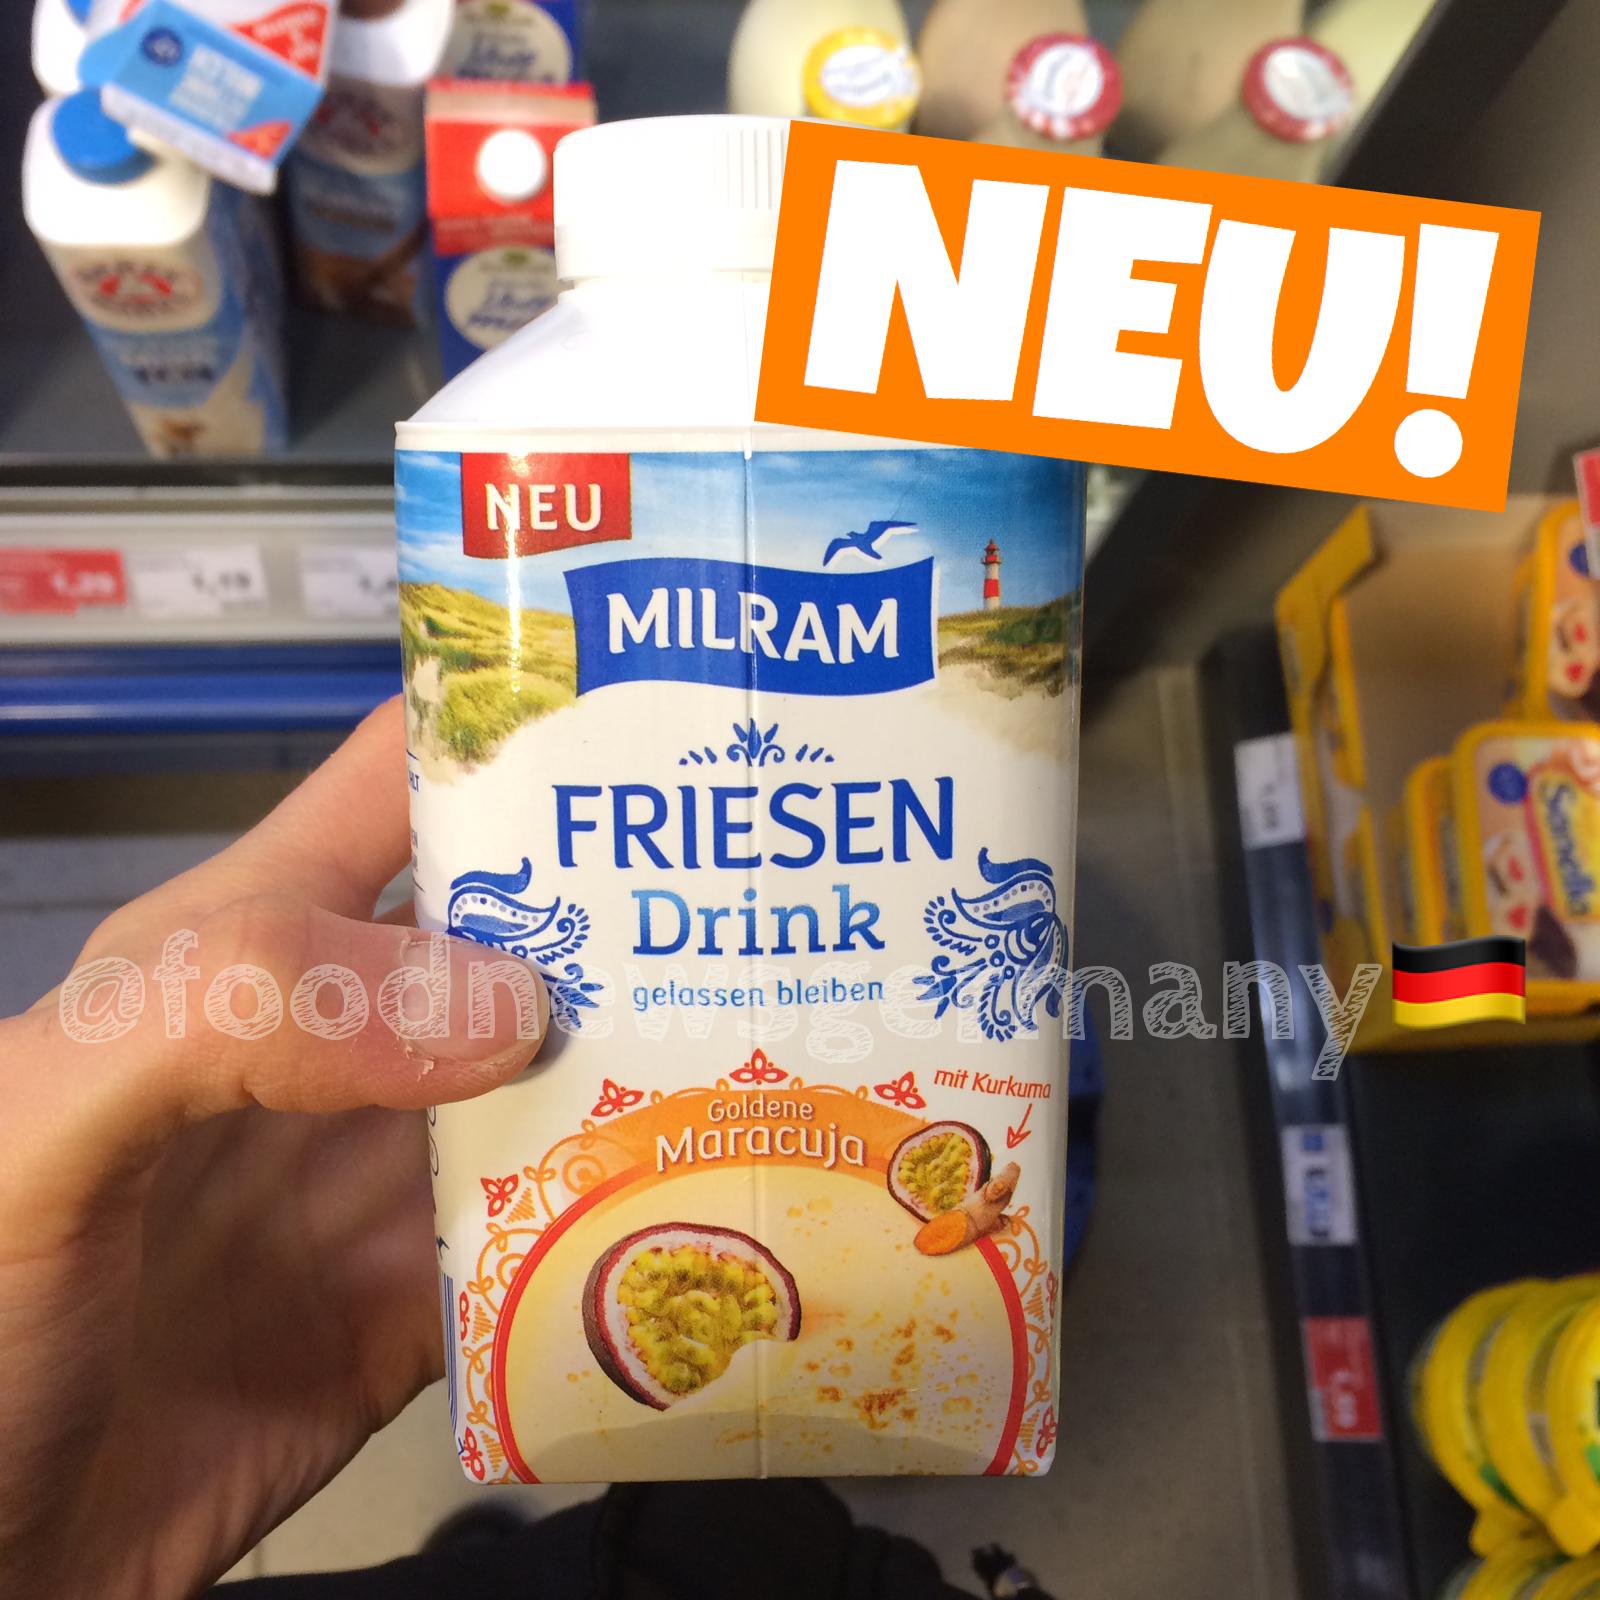 Milram Friesendrink